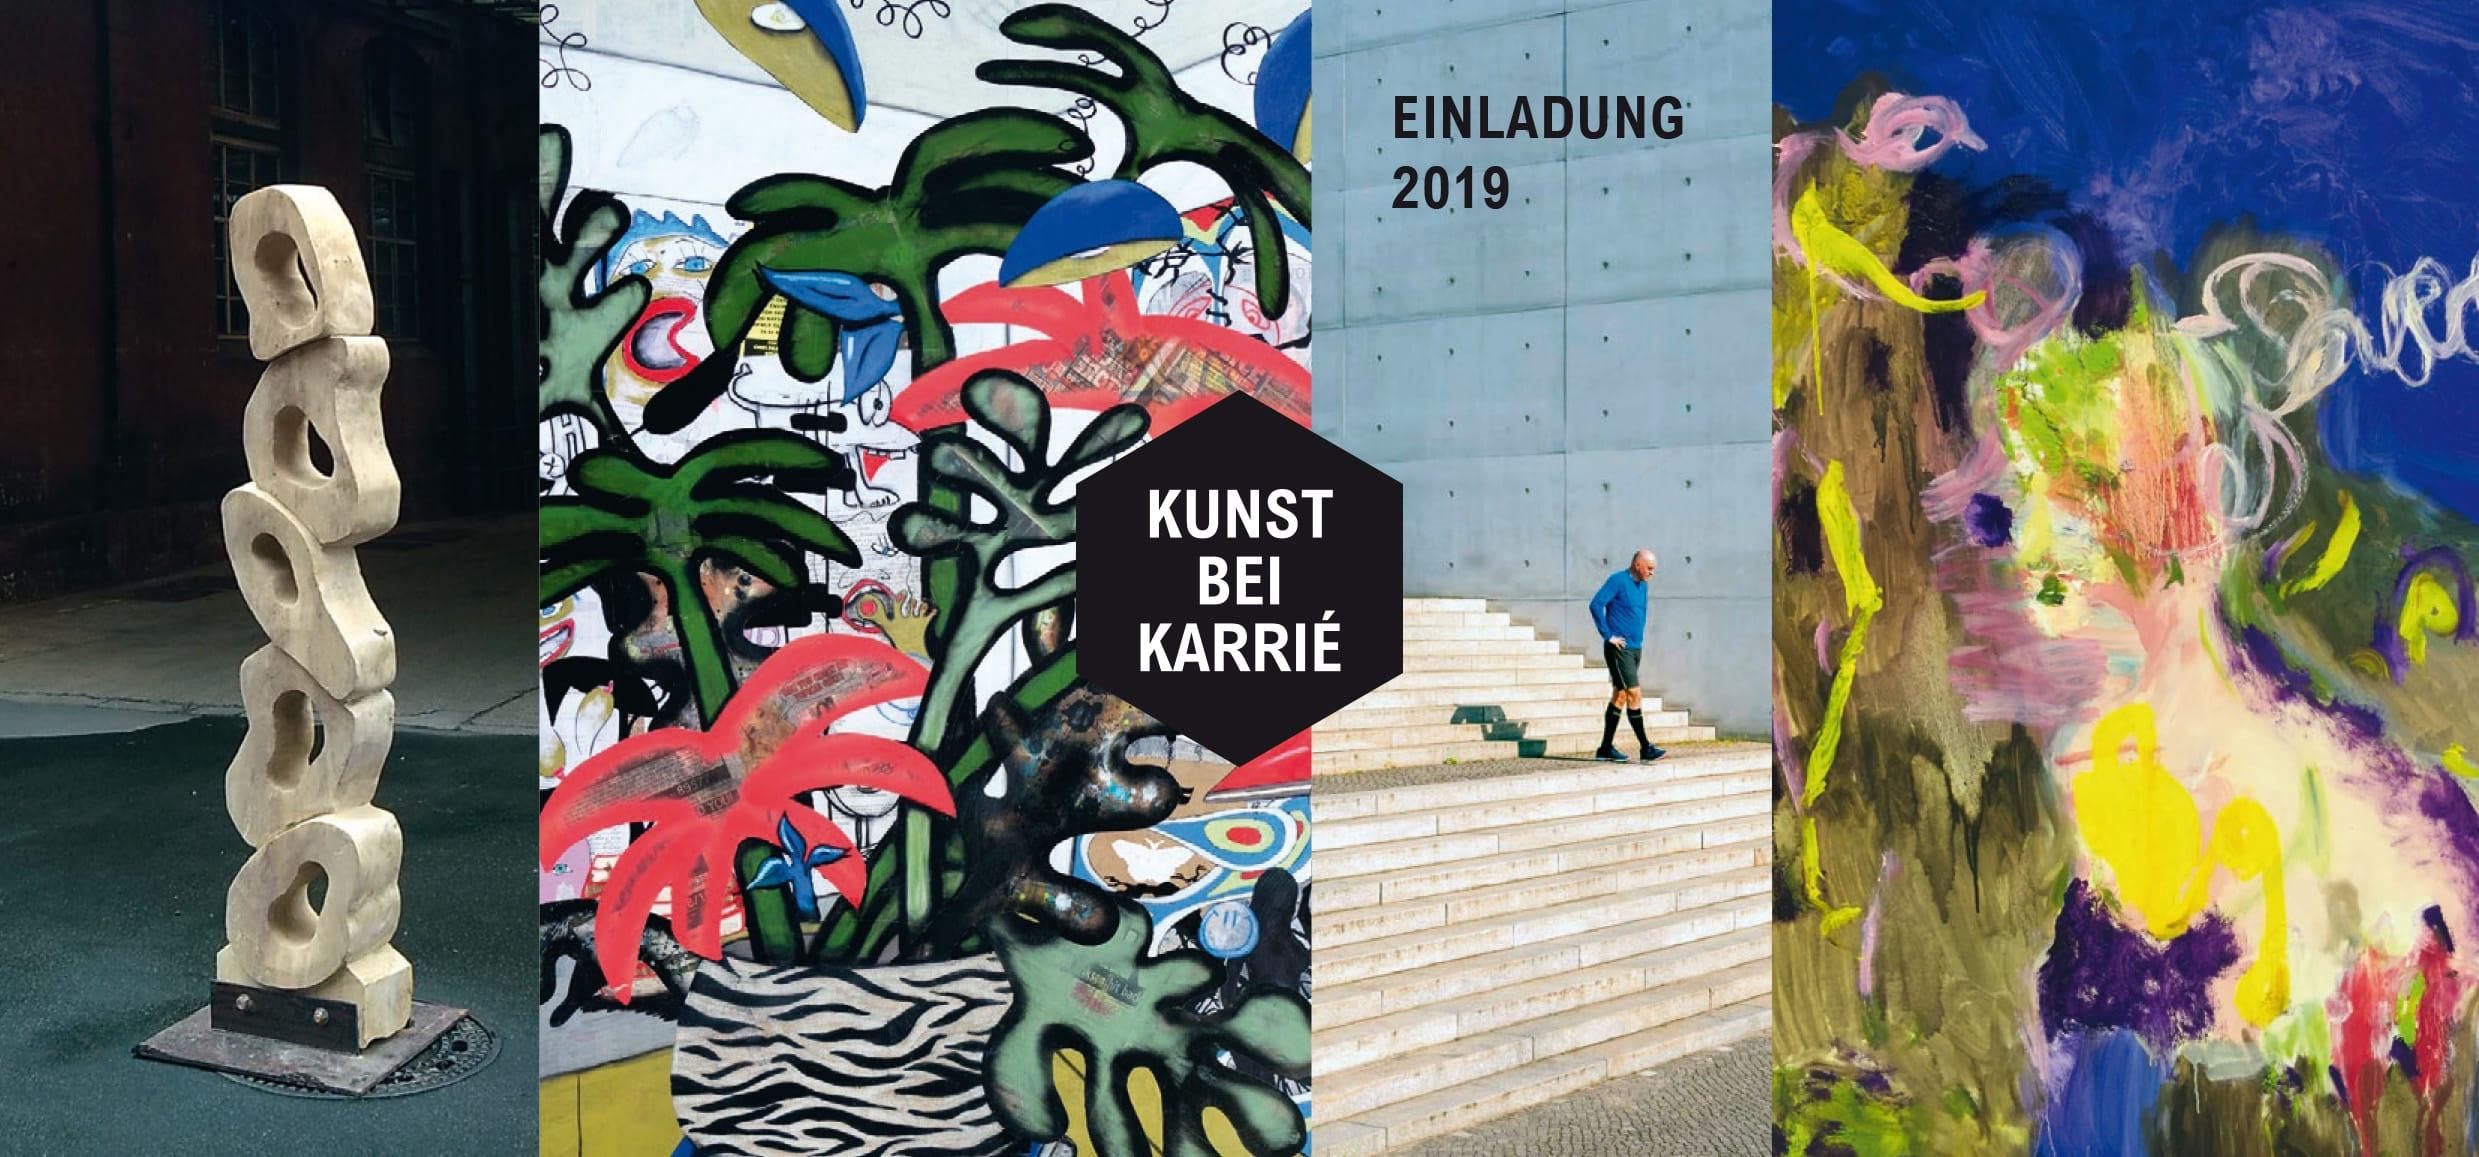 querformat-fotografie - Achim Katzberg - KbK_2019_Einladung_web